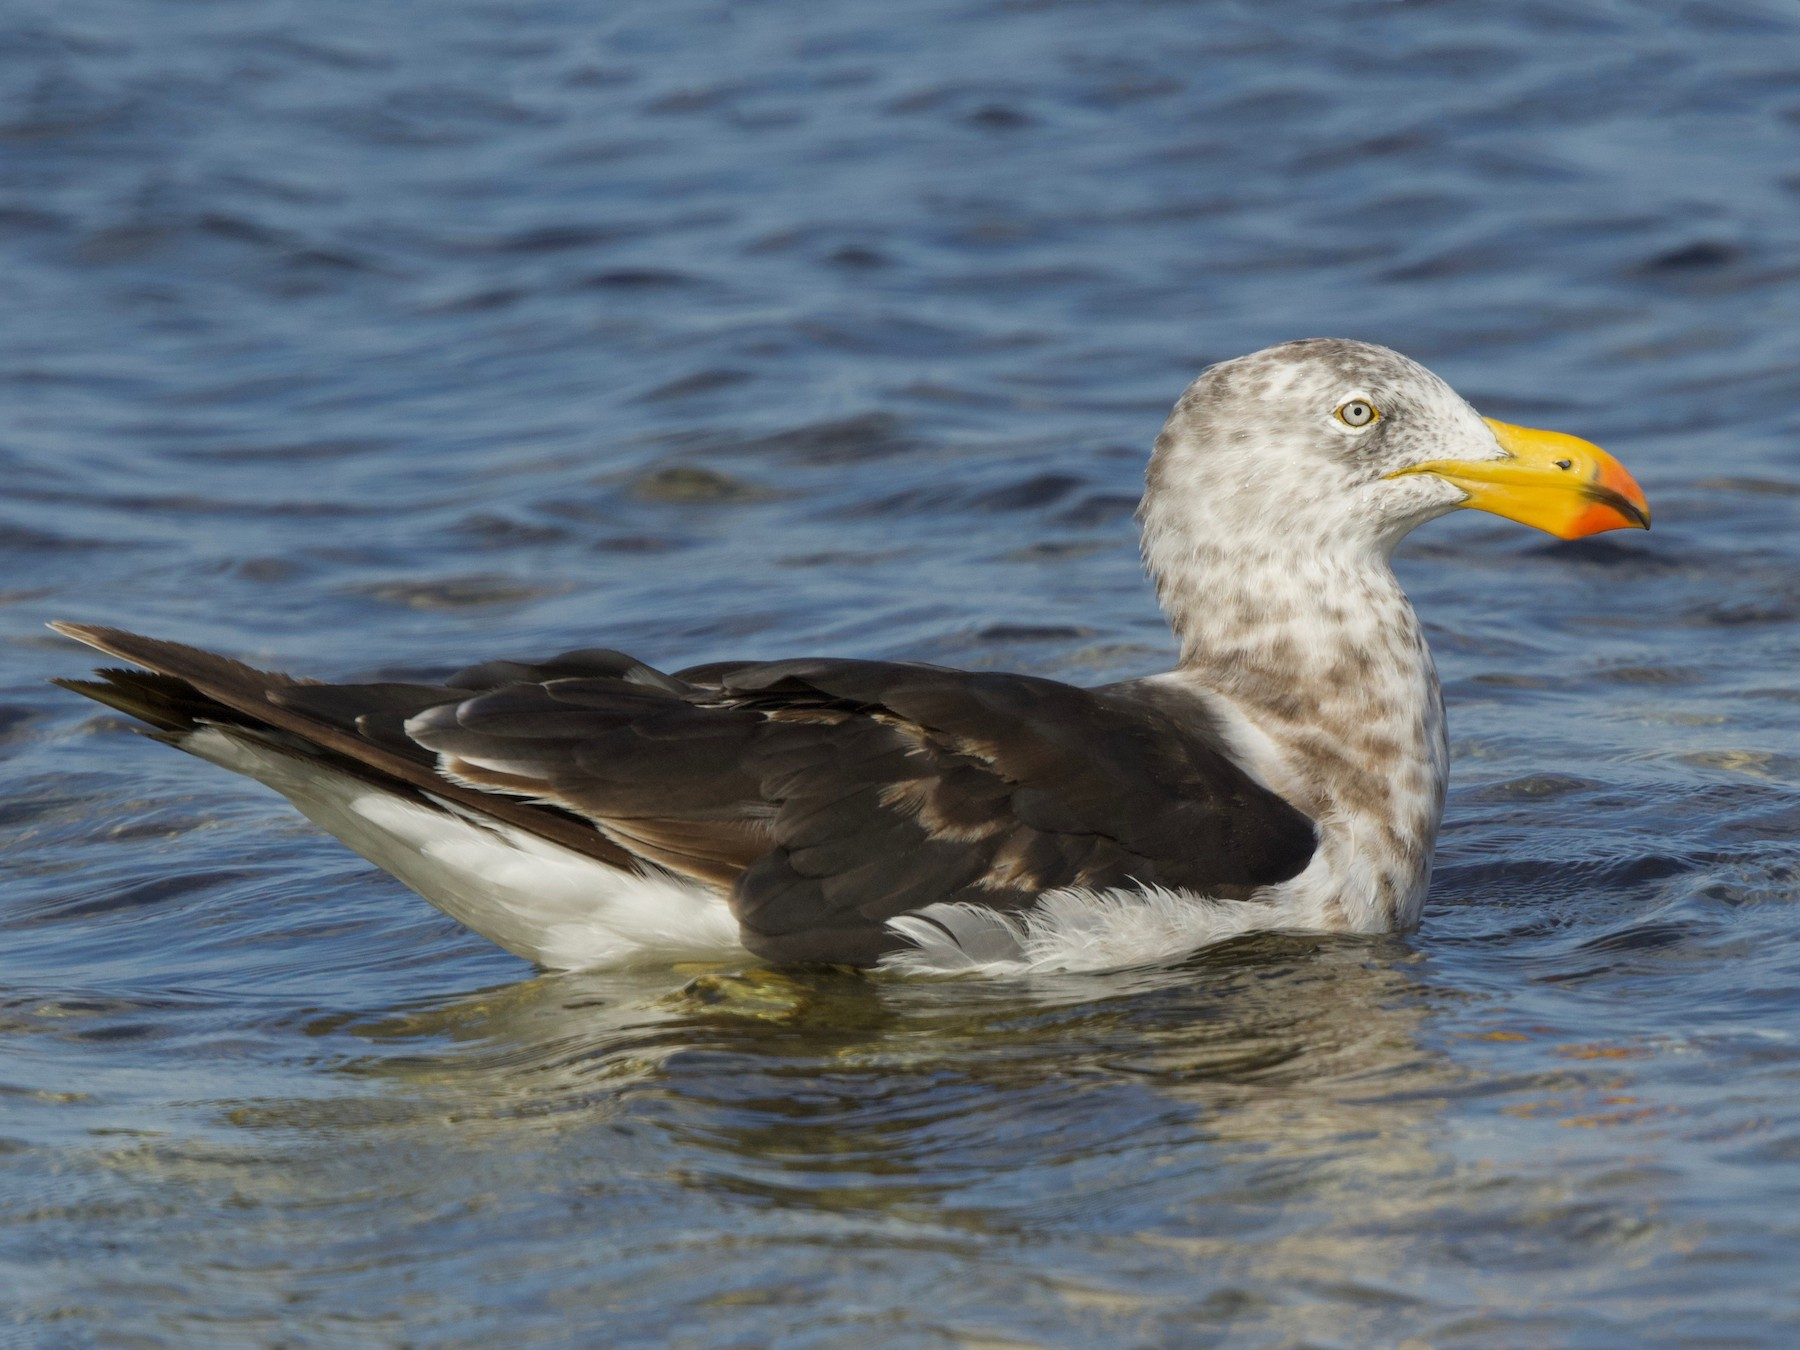 Pacific Gull - David  Tytherleigh